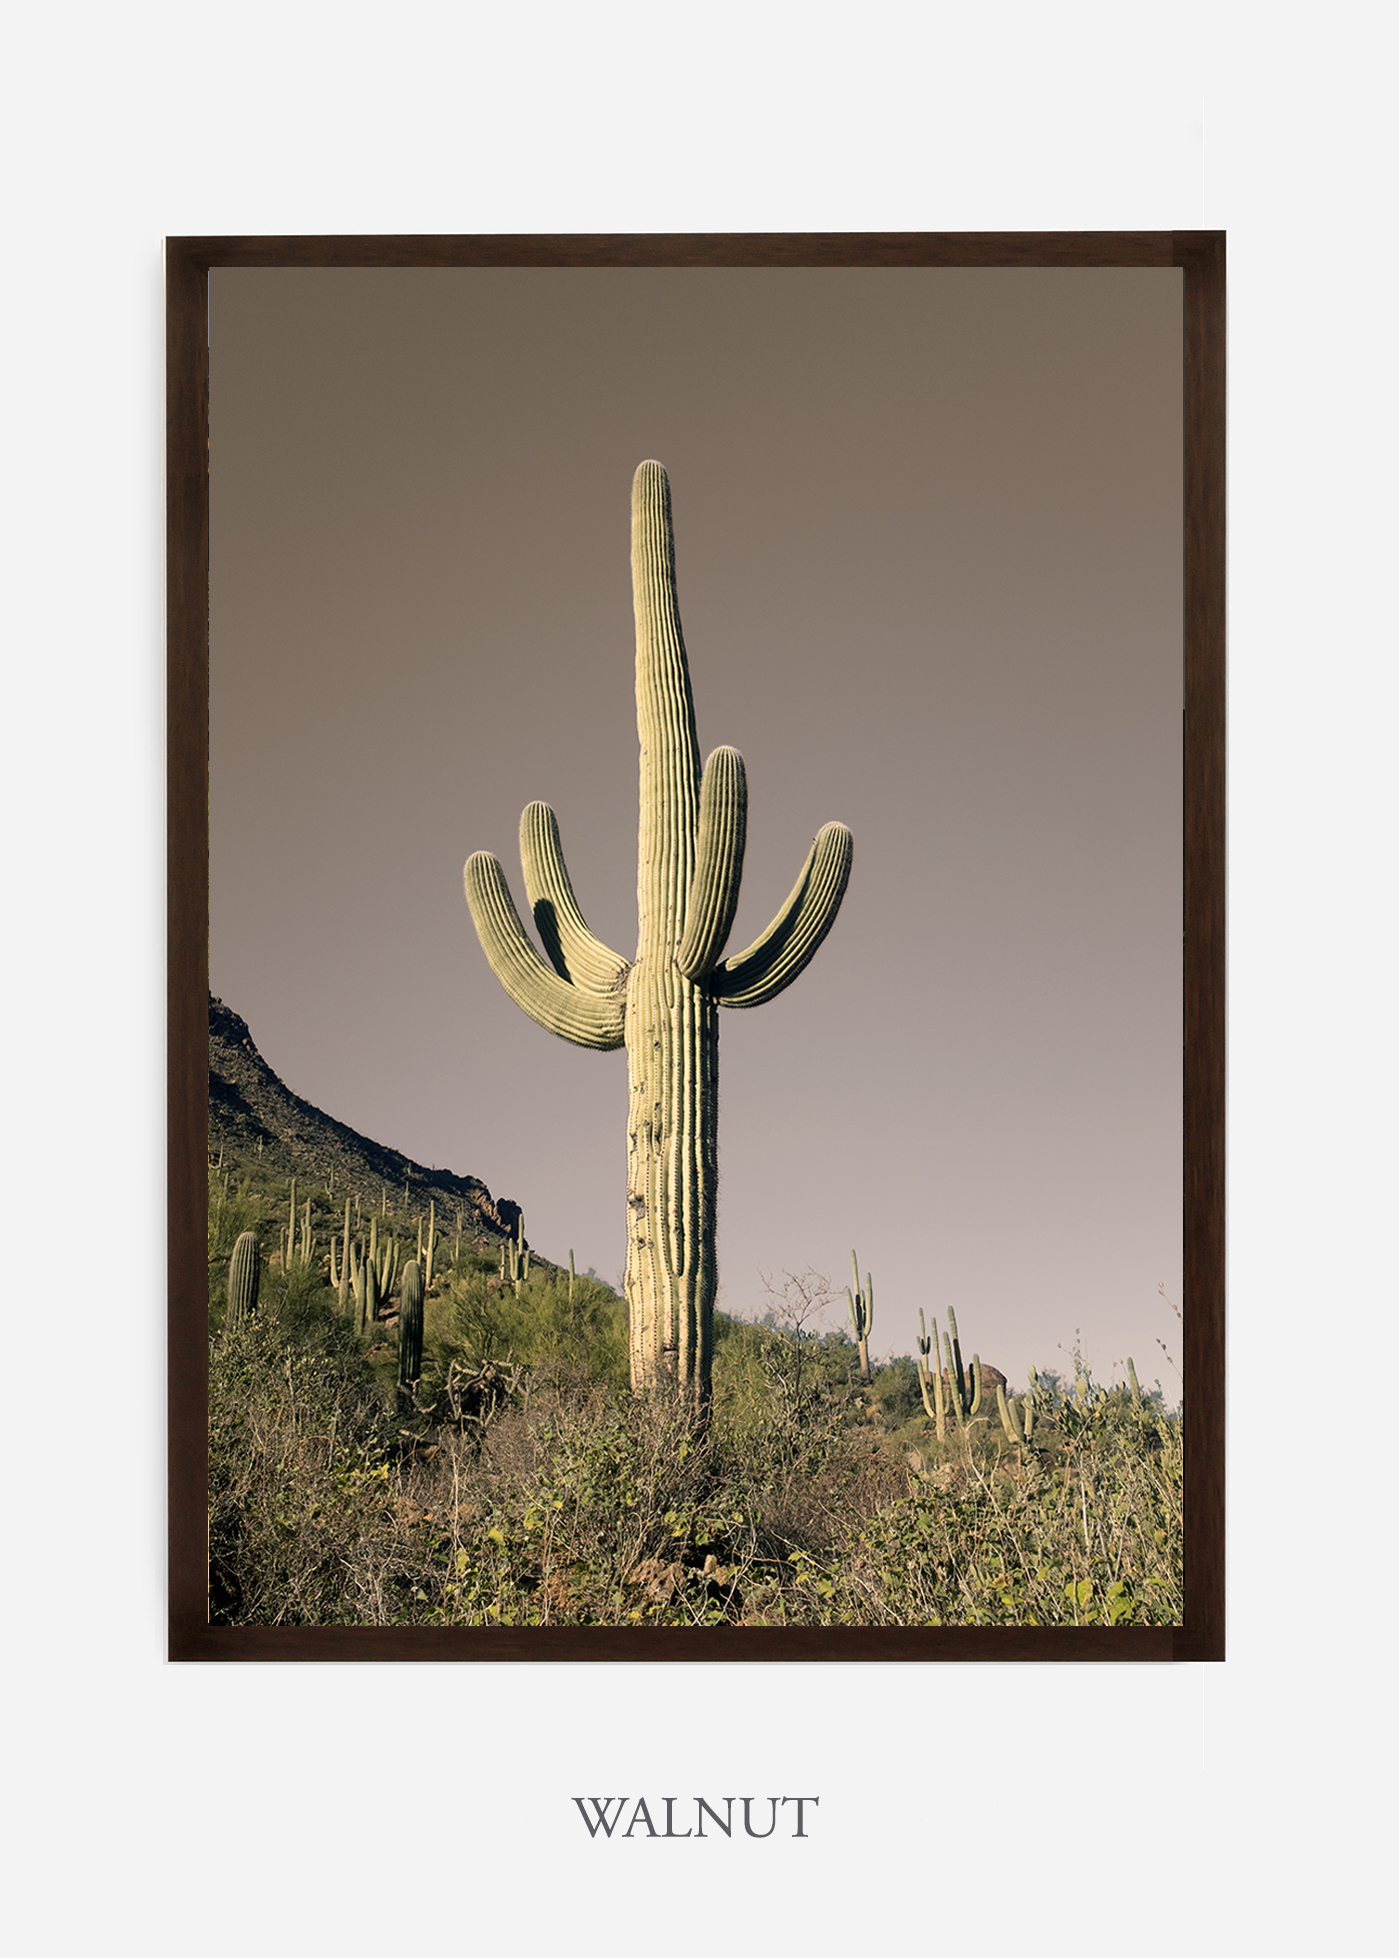 nomat-walnutframe-saguaroNo.20-wildercalifornia-art-wallart-cactusprint-homedecor-prints-arizona-botanical-artwork-interiordesign.jpg